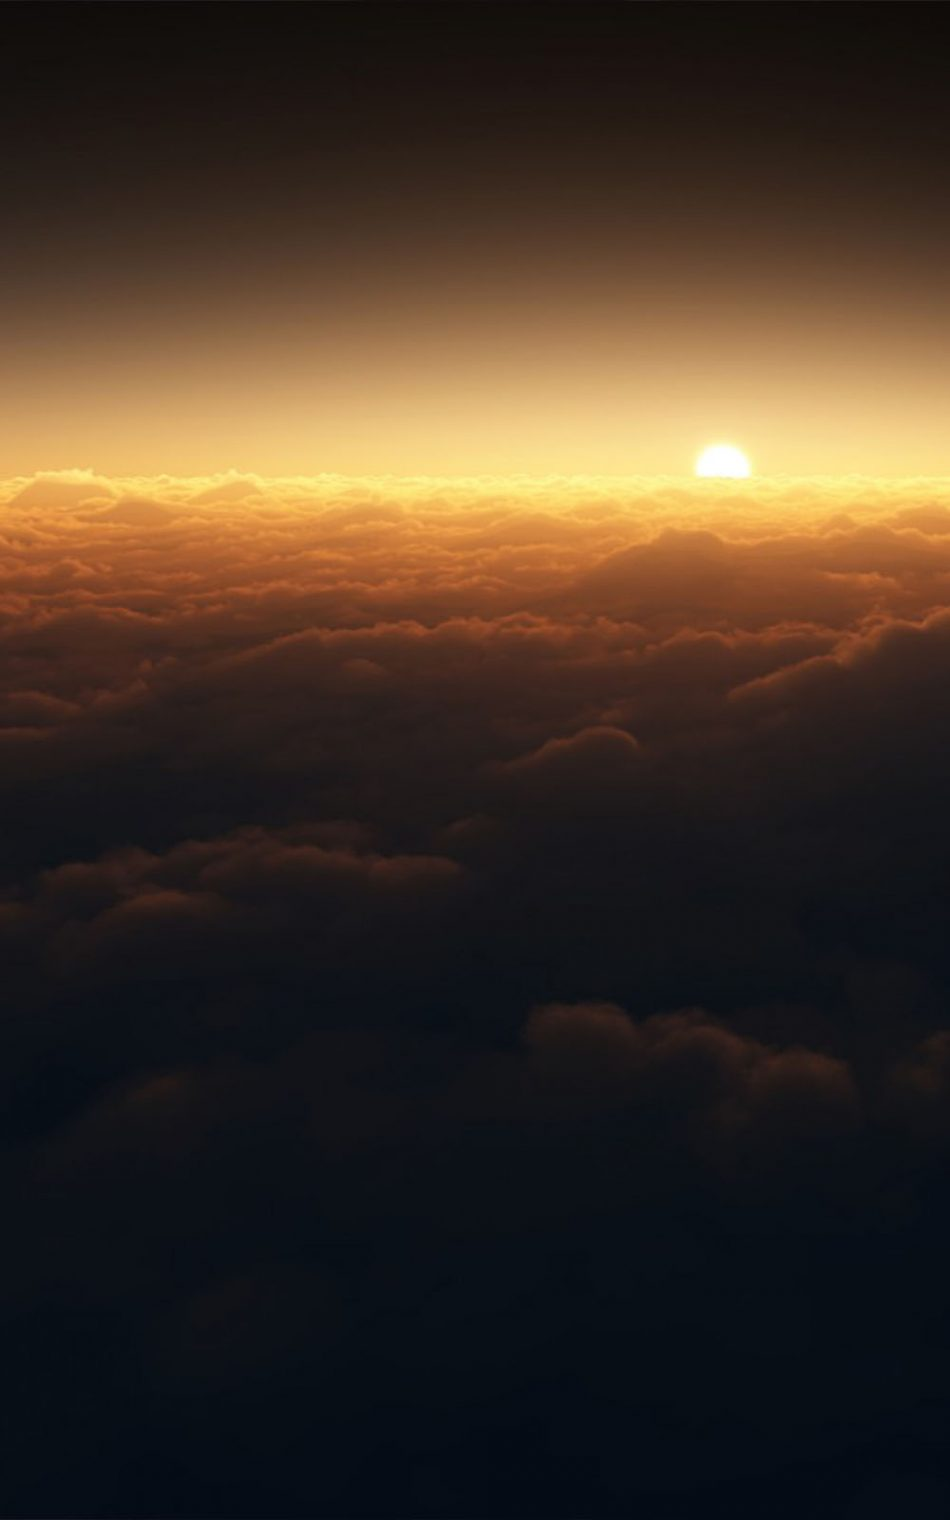 Dark Clouds Sunset HD Mobile Wallpaper